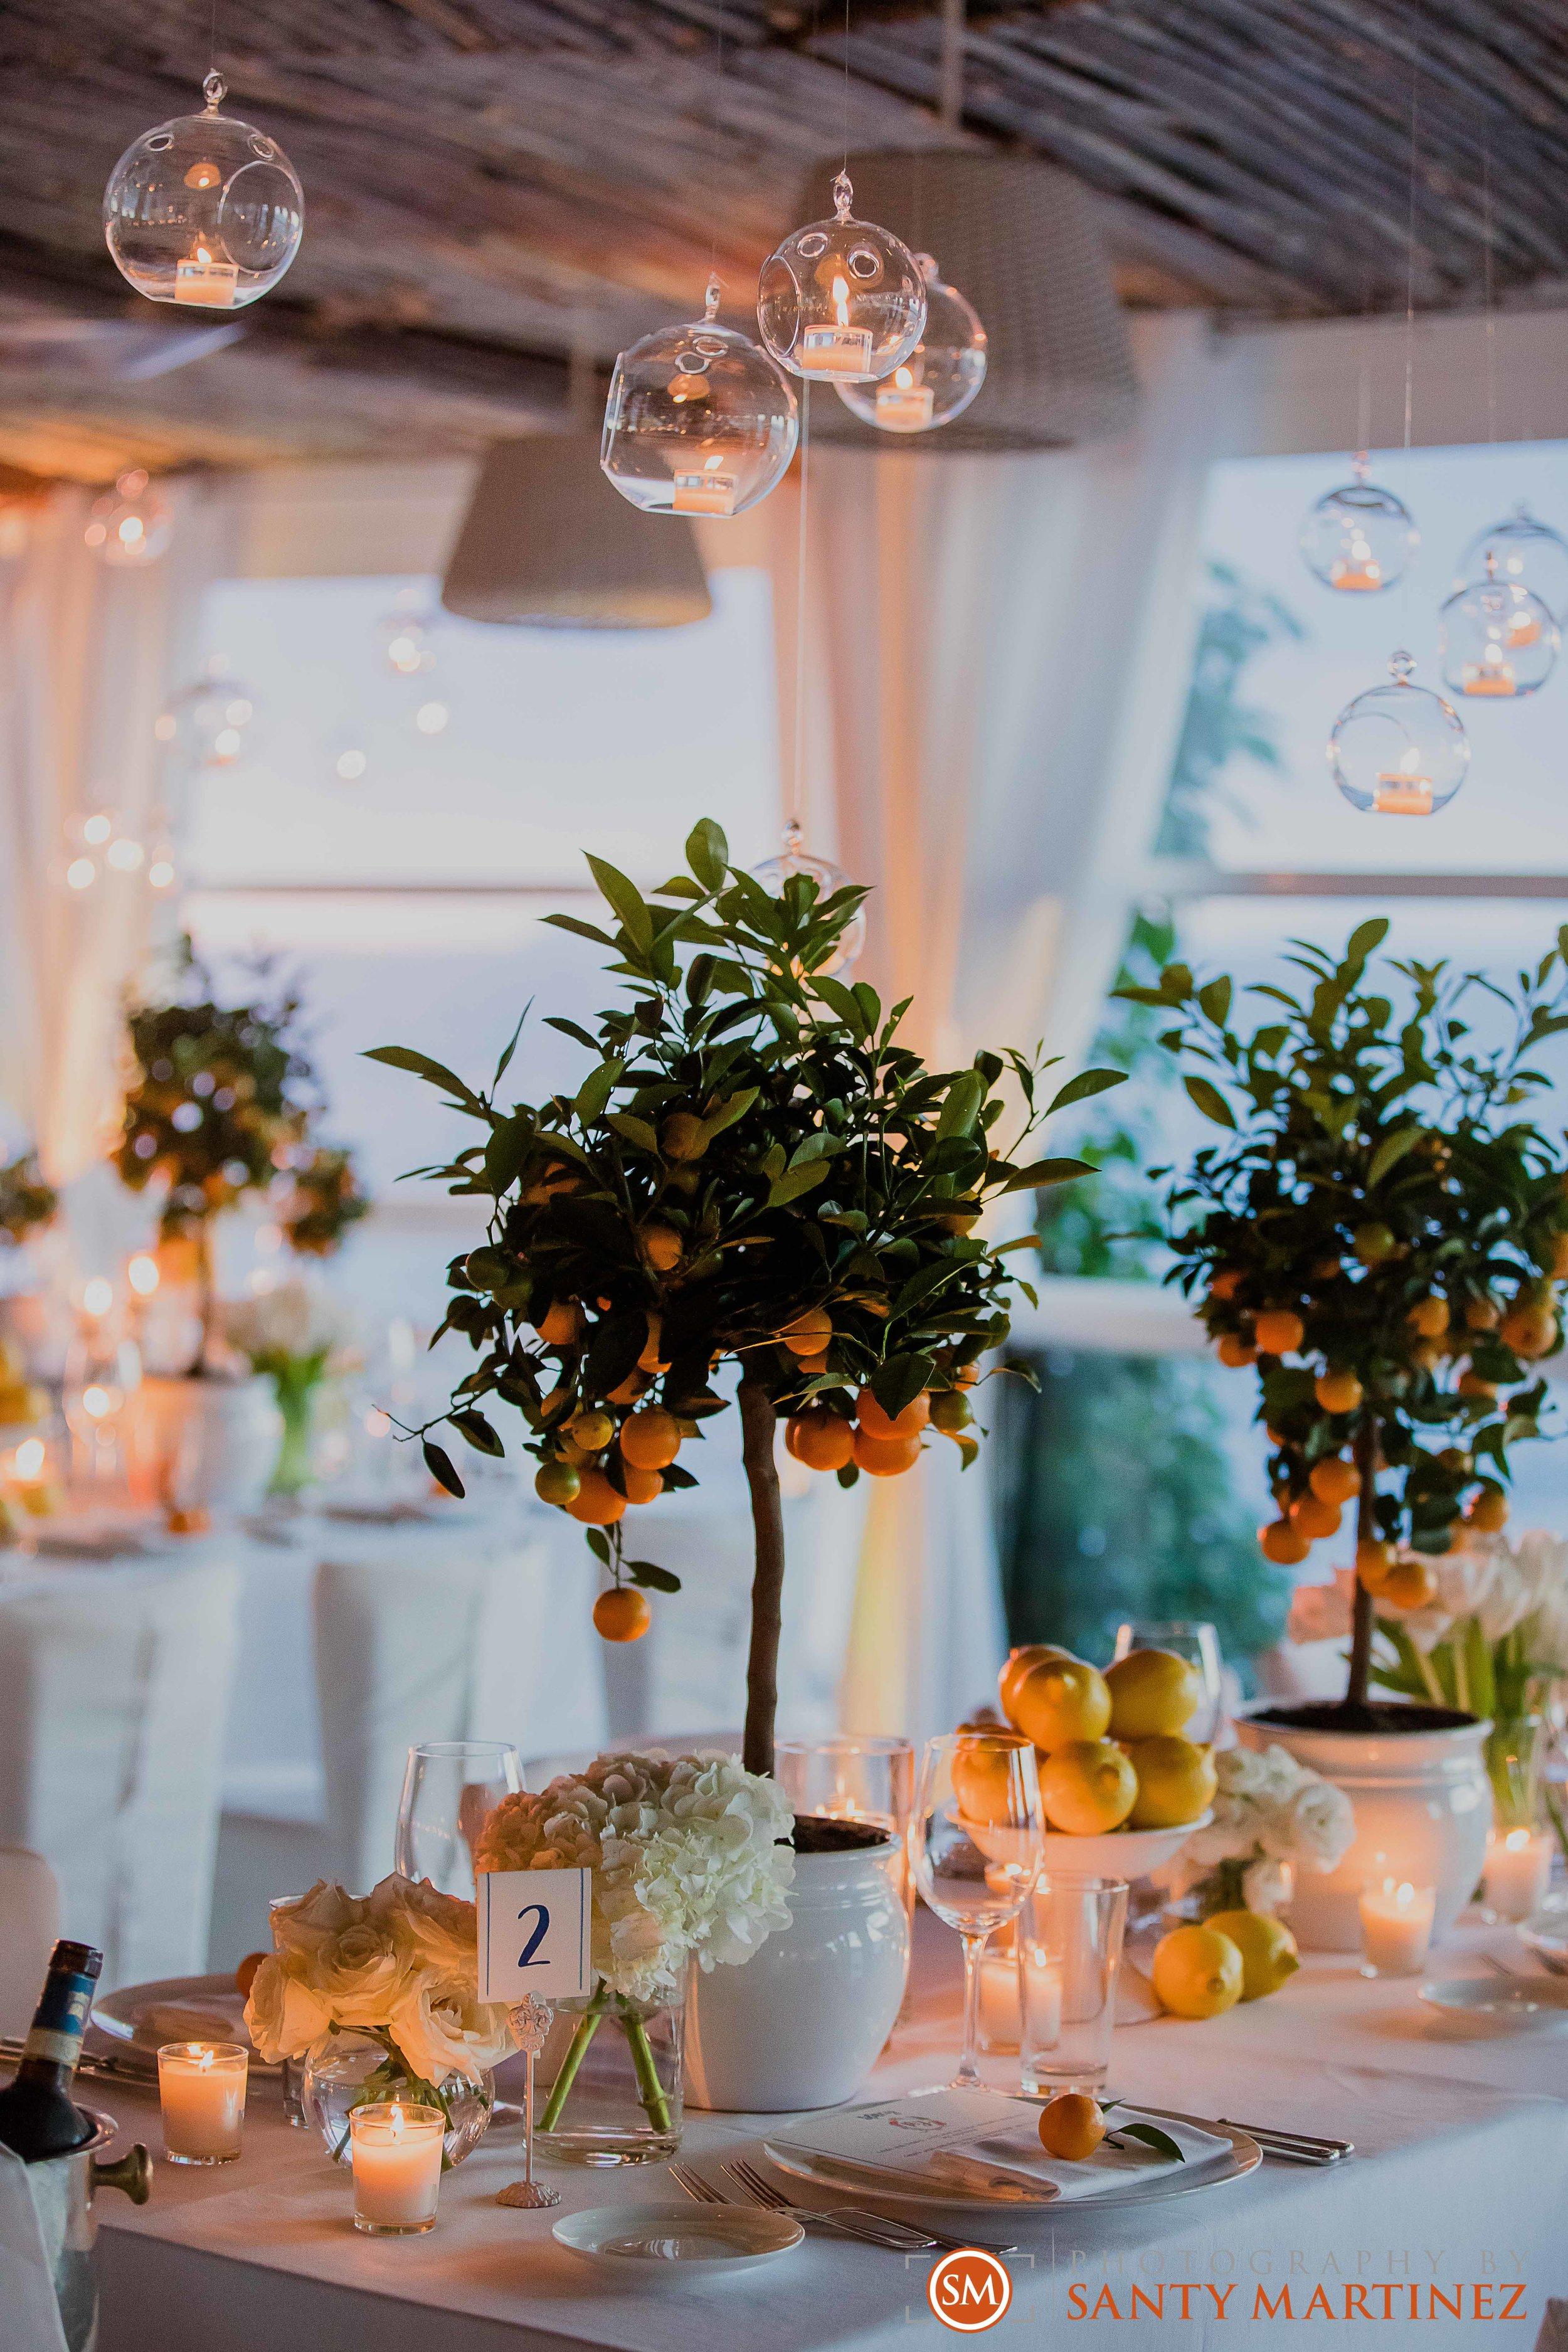 Wedding Capri Italy - Photography by Santy Martinez-58.jpg